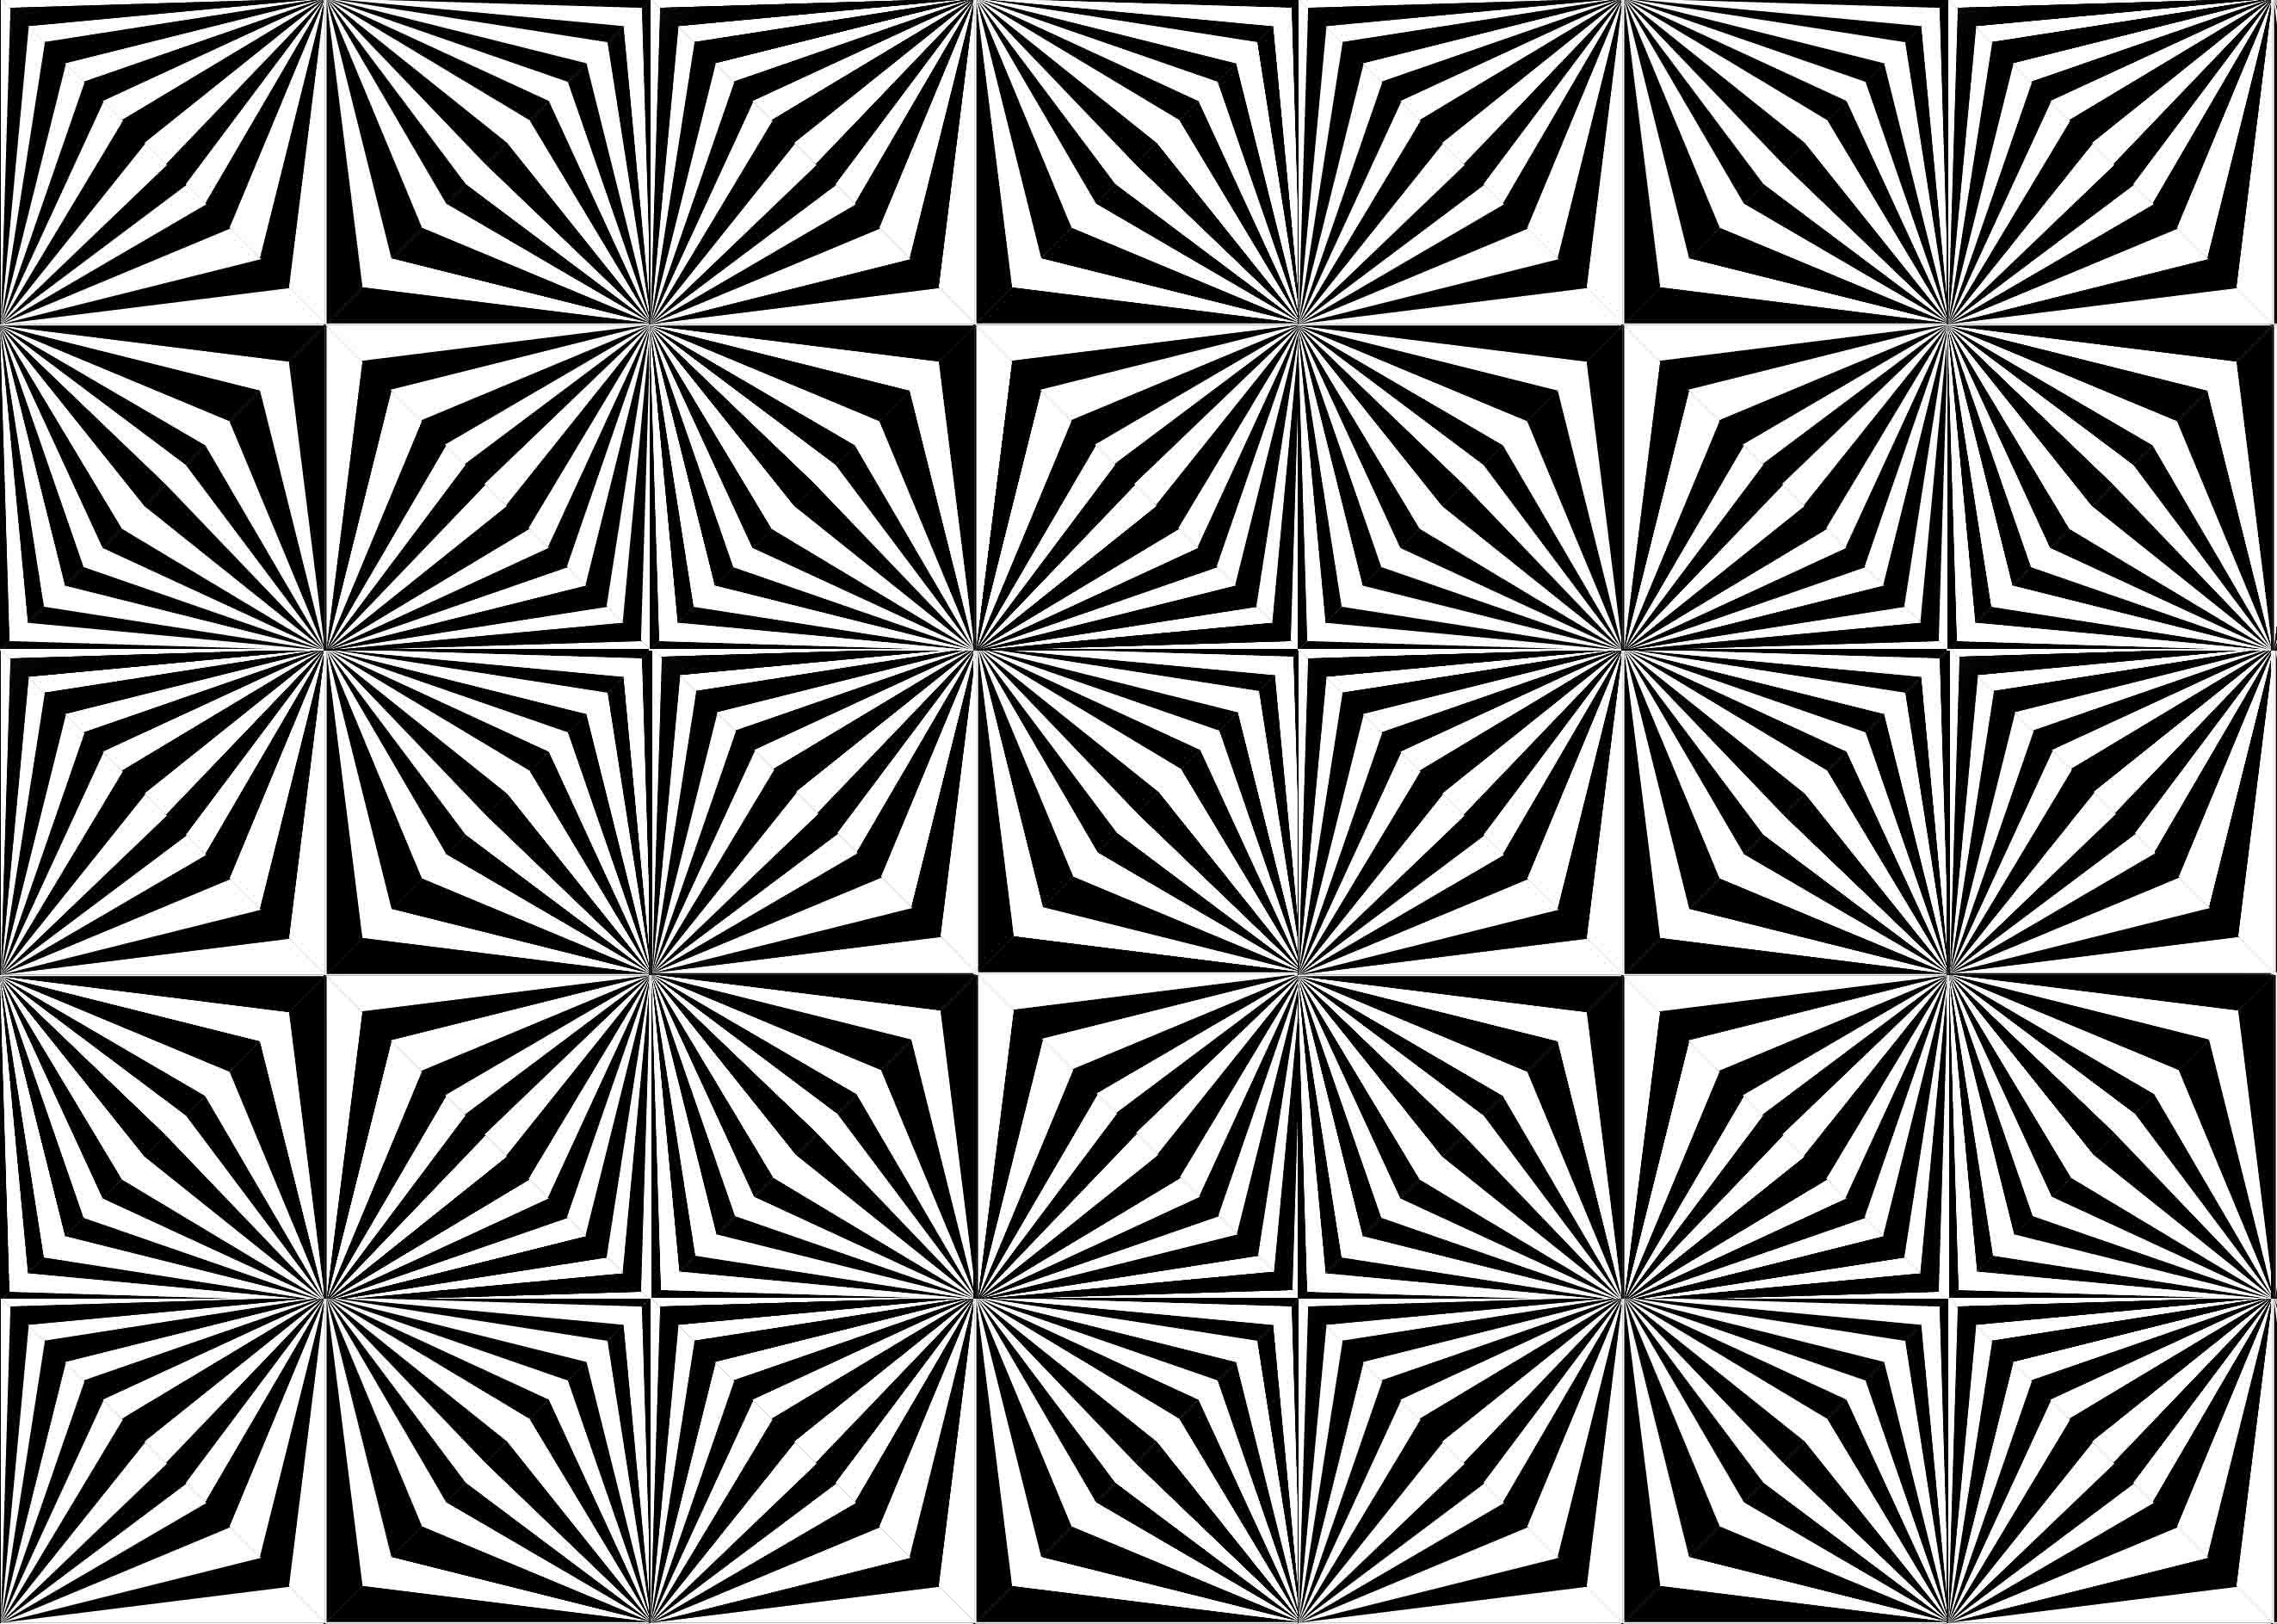 Optical Patterns - Justlatzcom Optical Illusion Art Pattern - Tattoo,